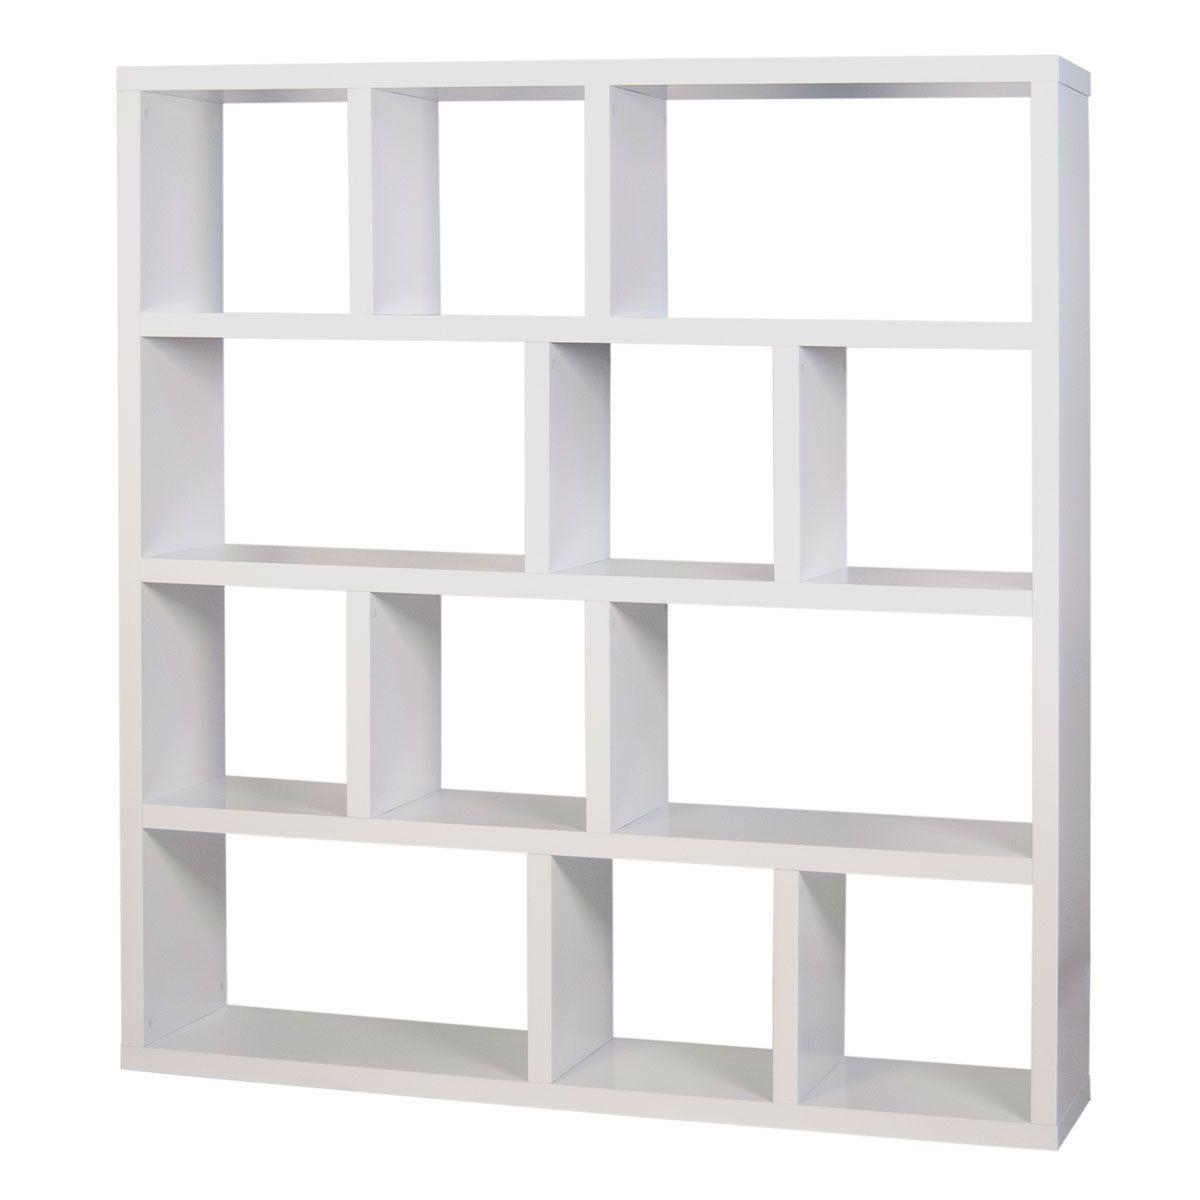 Etagere Expedit Blanc Fabulous Afbeelding In Ladder Model Domeno  # Meuble Expedit Blanc